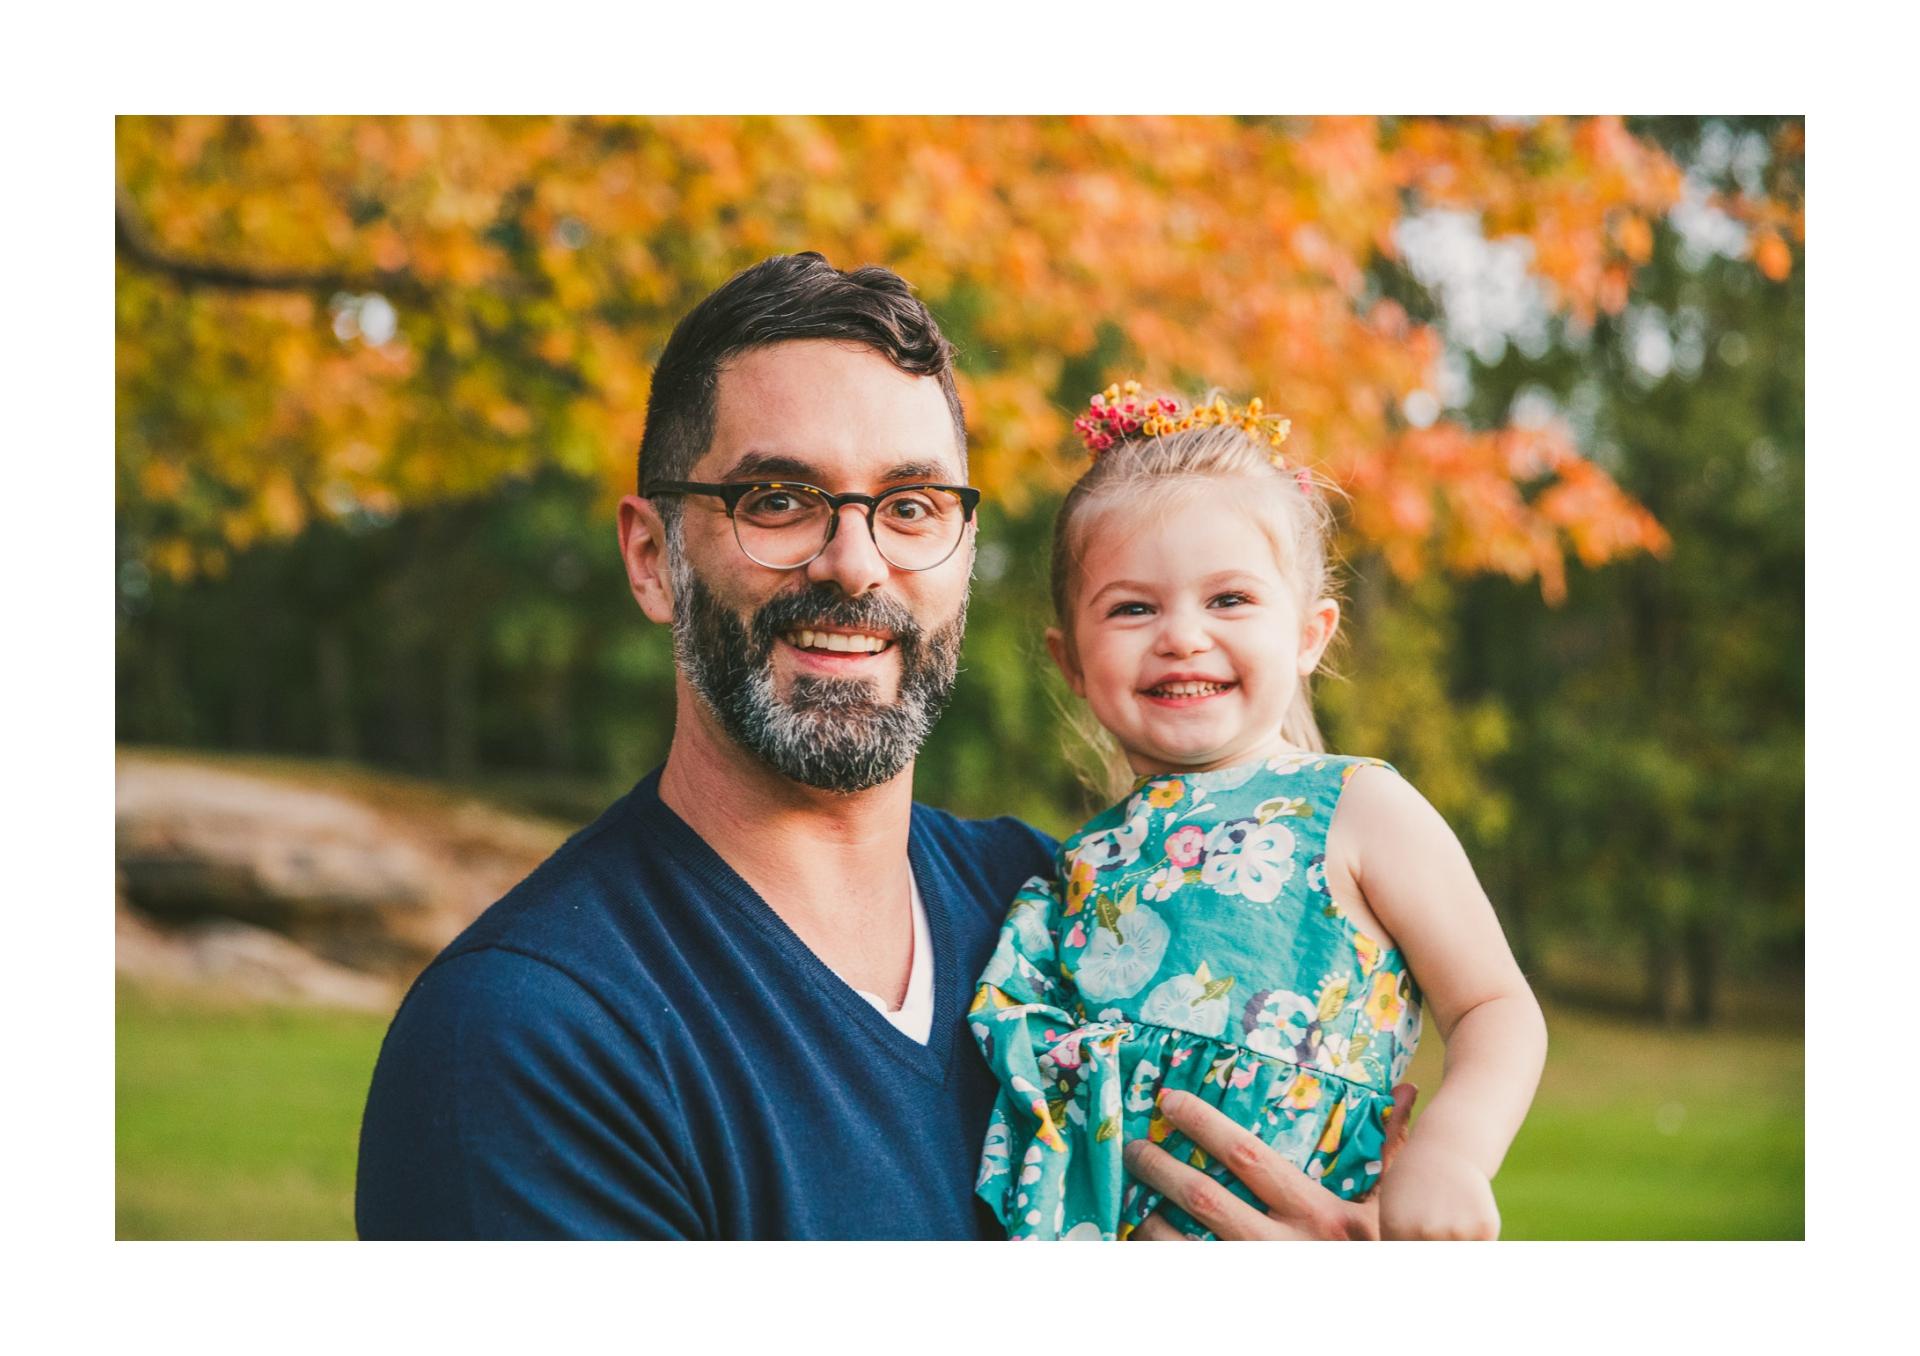 Lakewood Family Fall Portrait Photographer 28.jpg